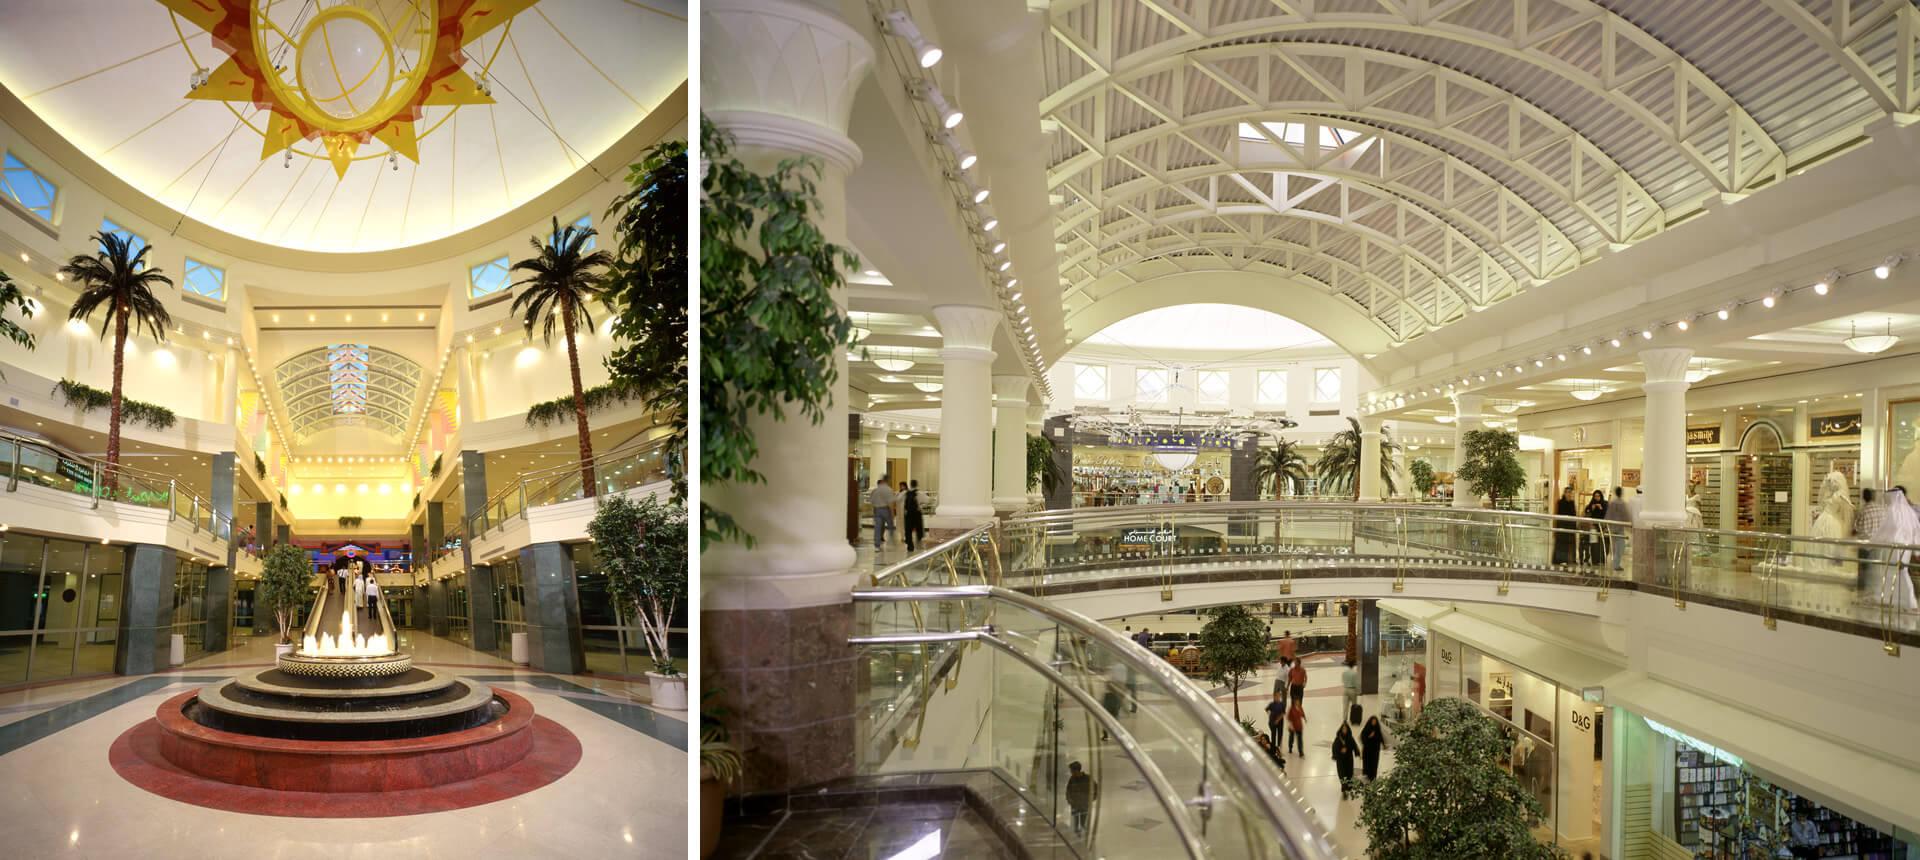 Deira City Centre - CallisonRTKL